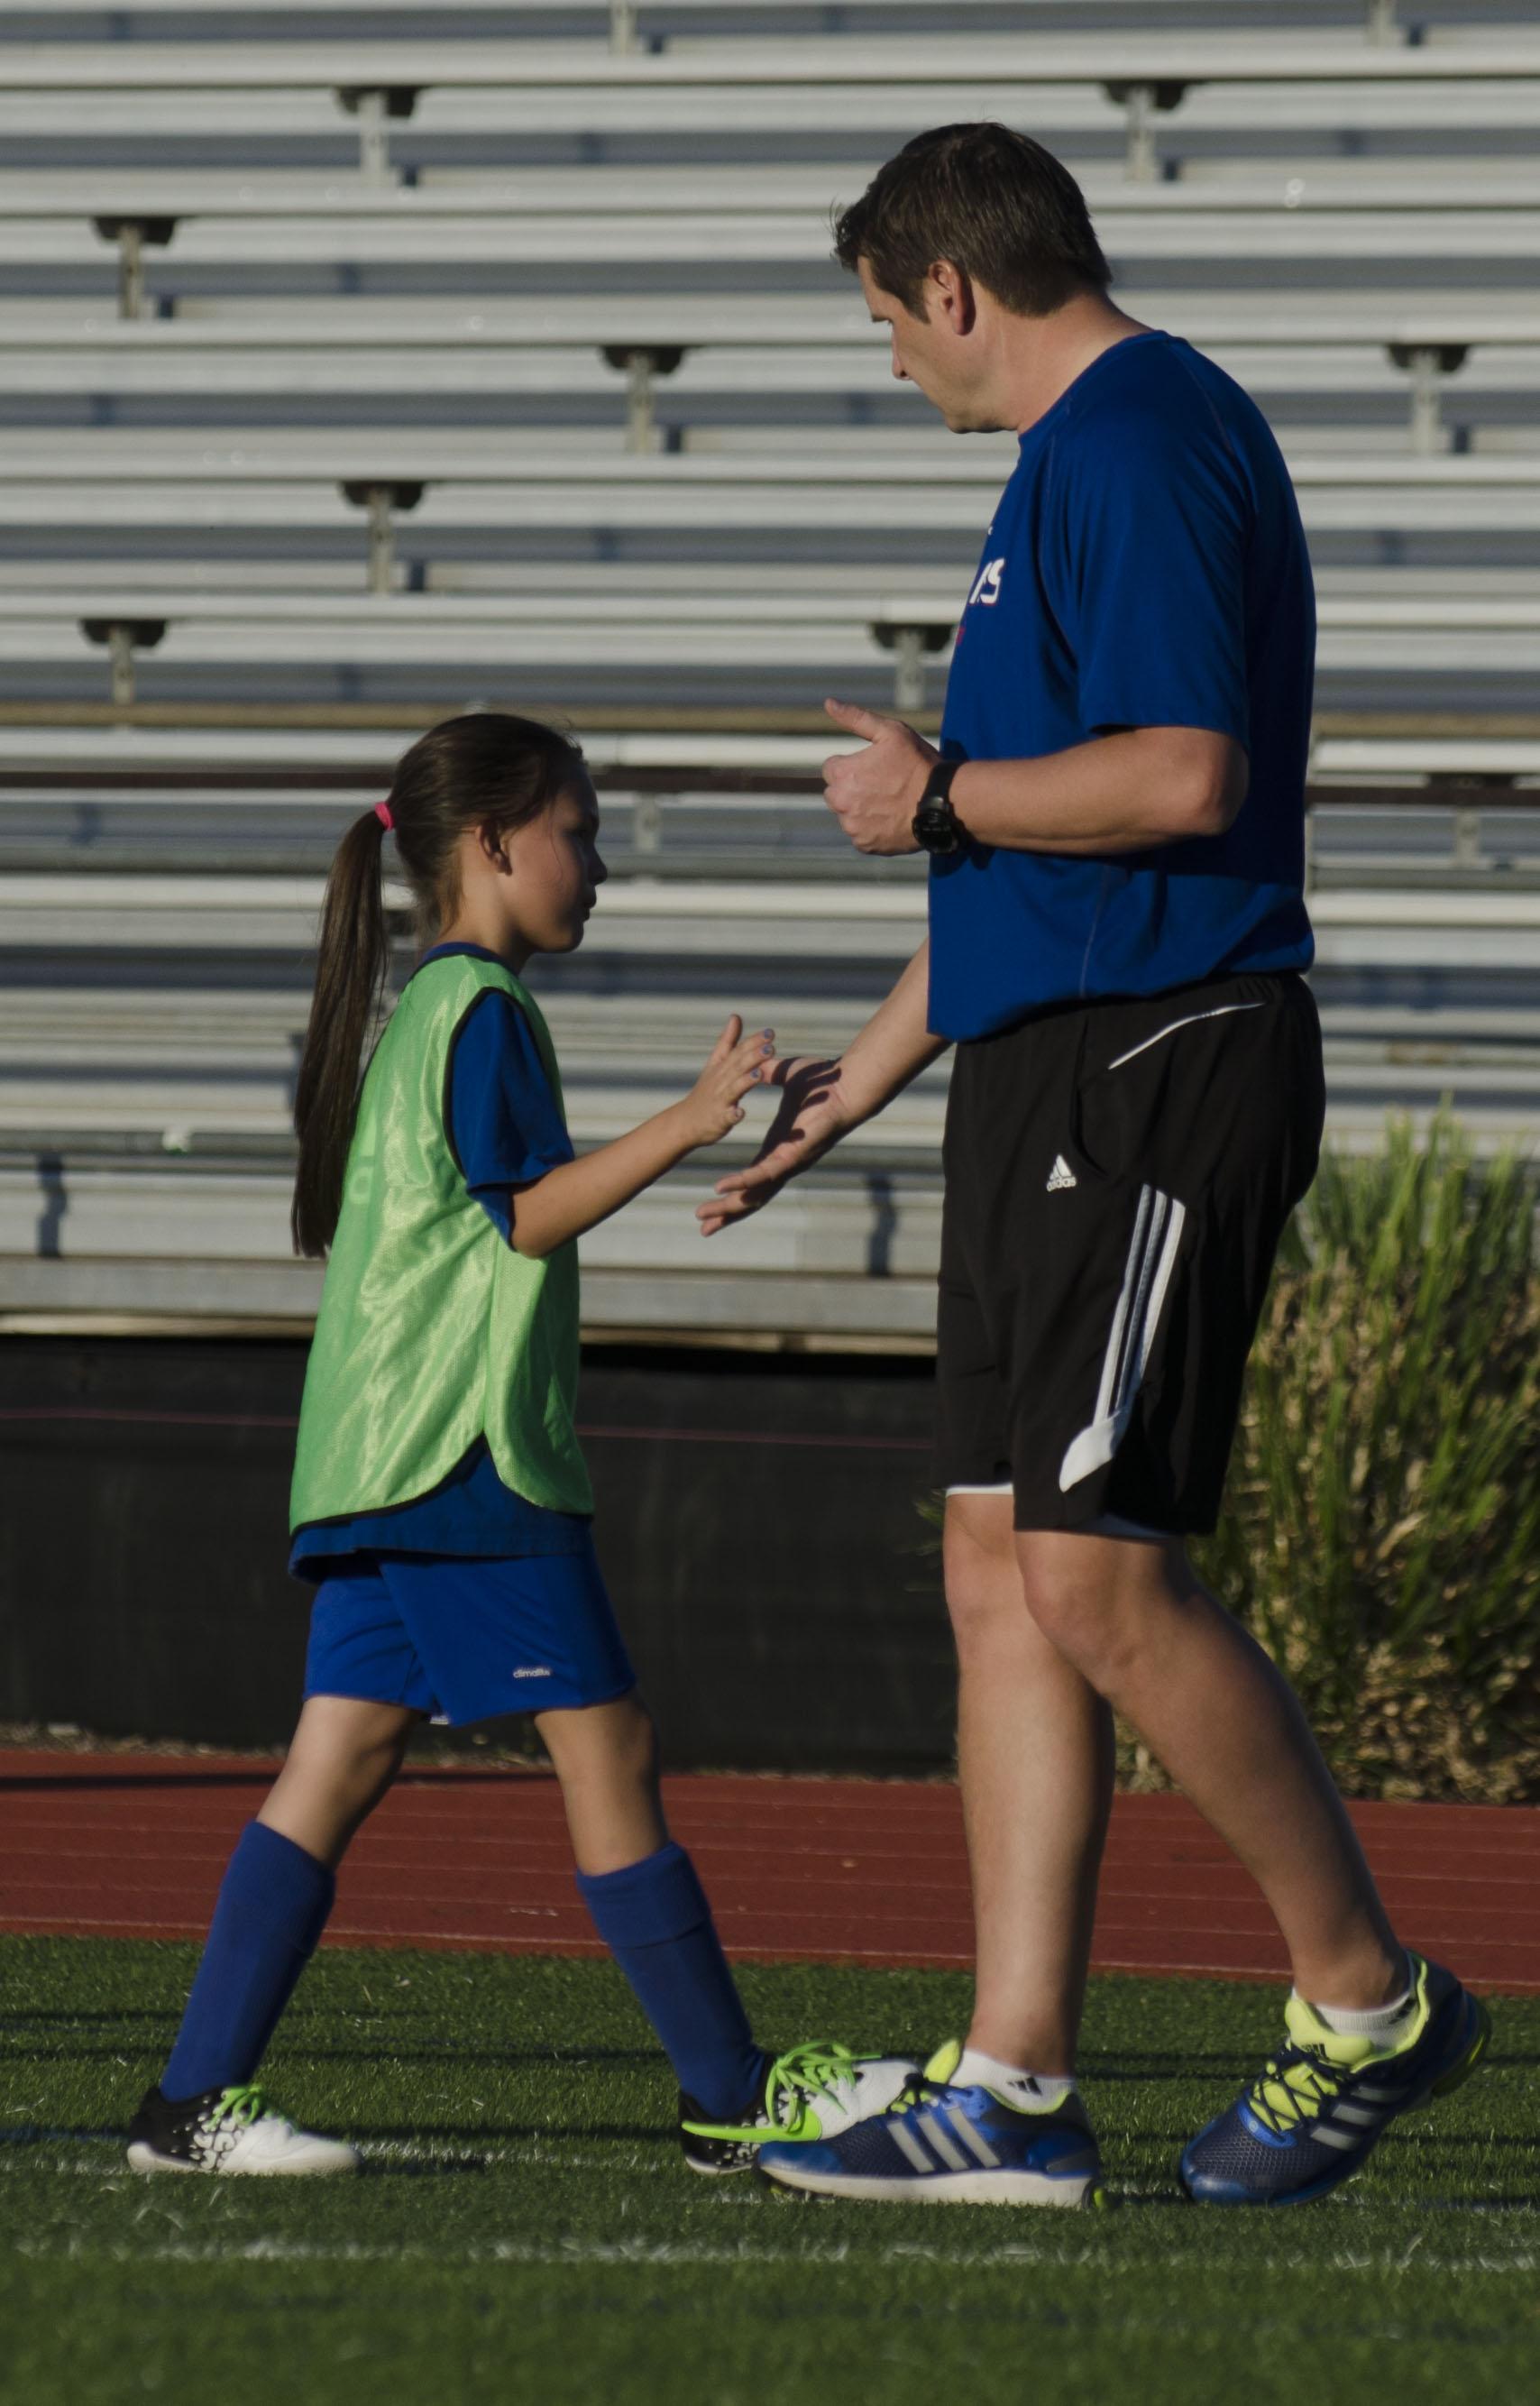 Coach High Five